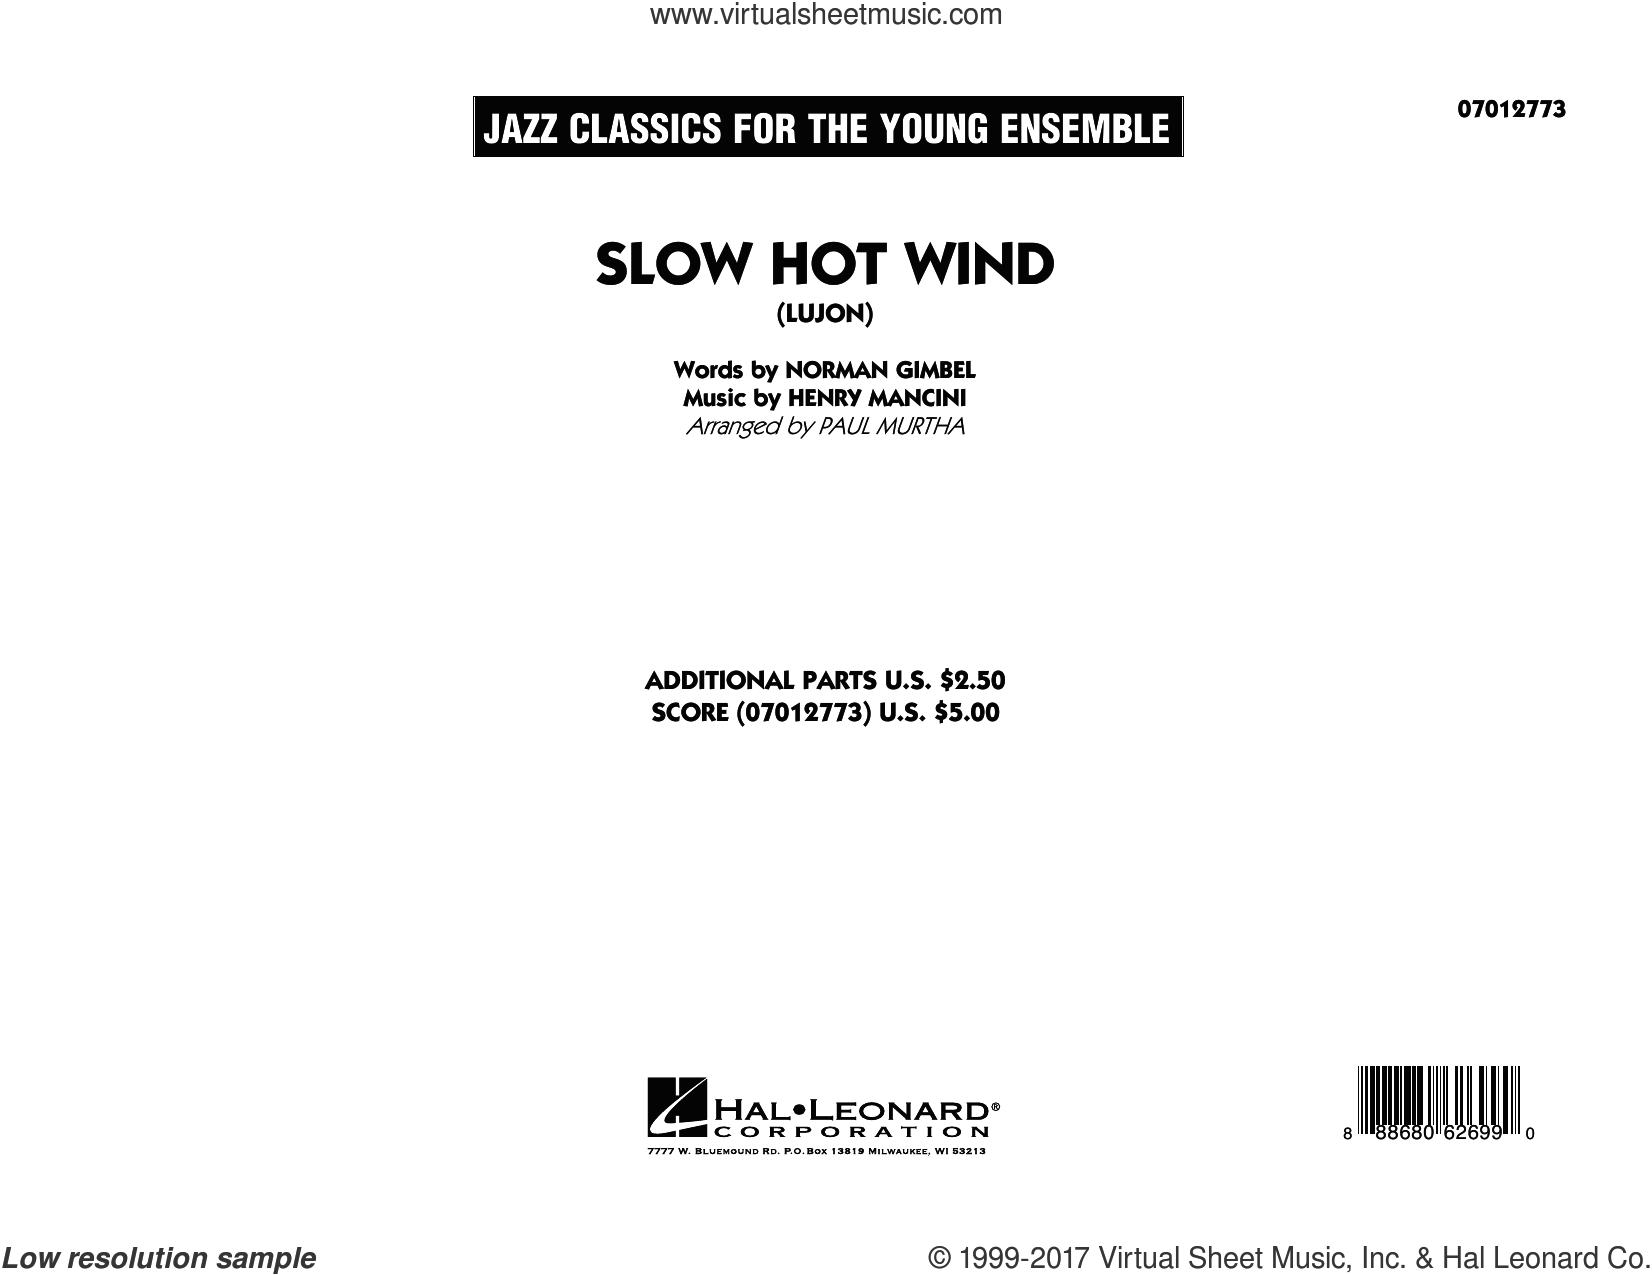 Slow Hot Wind (Lujon) (COMPLETE) sheet music for jazz band by Henry Mancini, Norman Gimbel and Paul Murtha, intermediate skill level